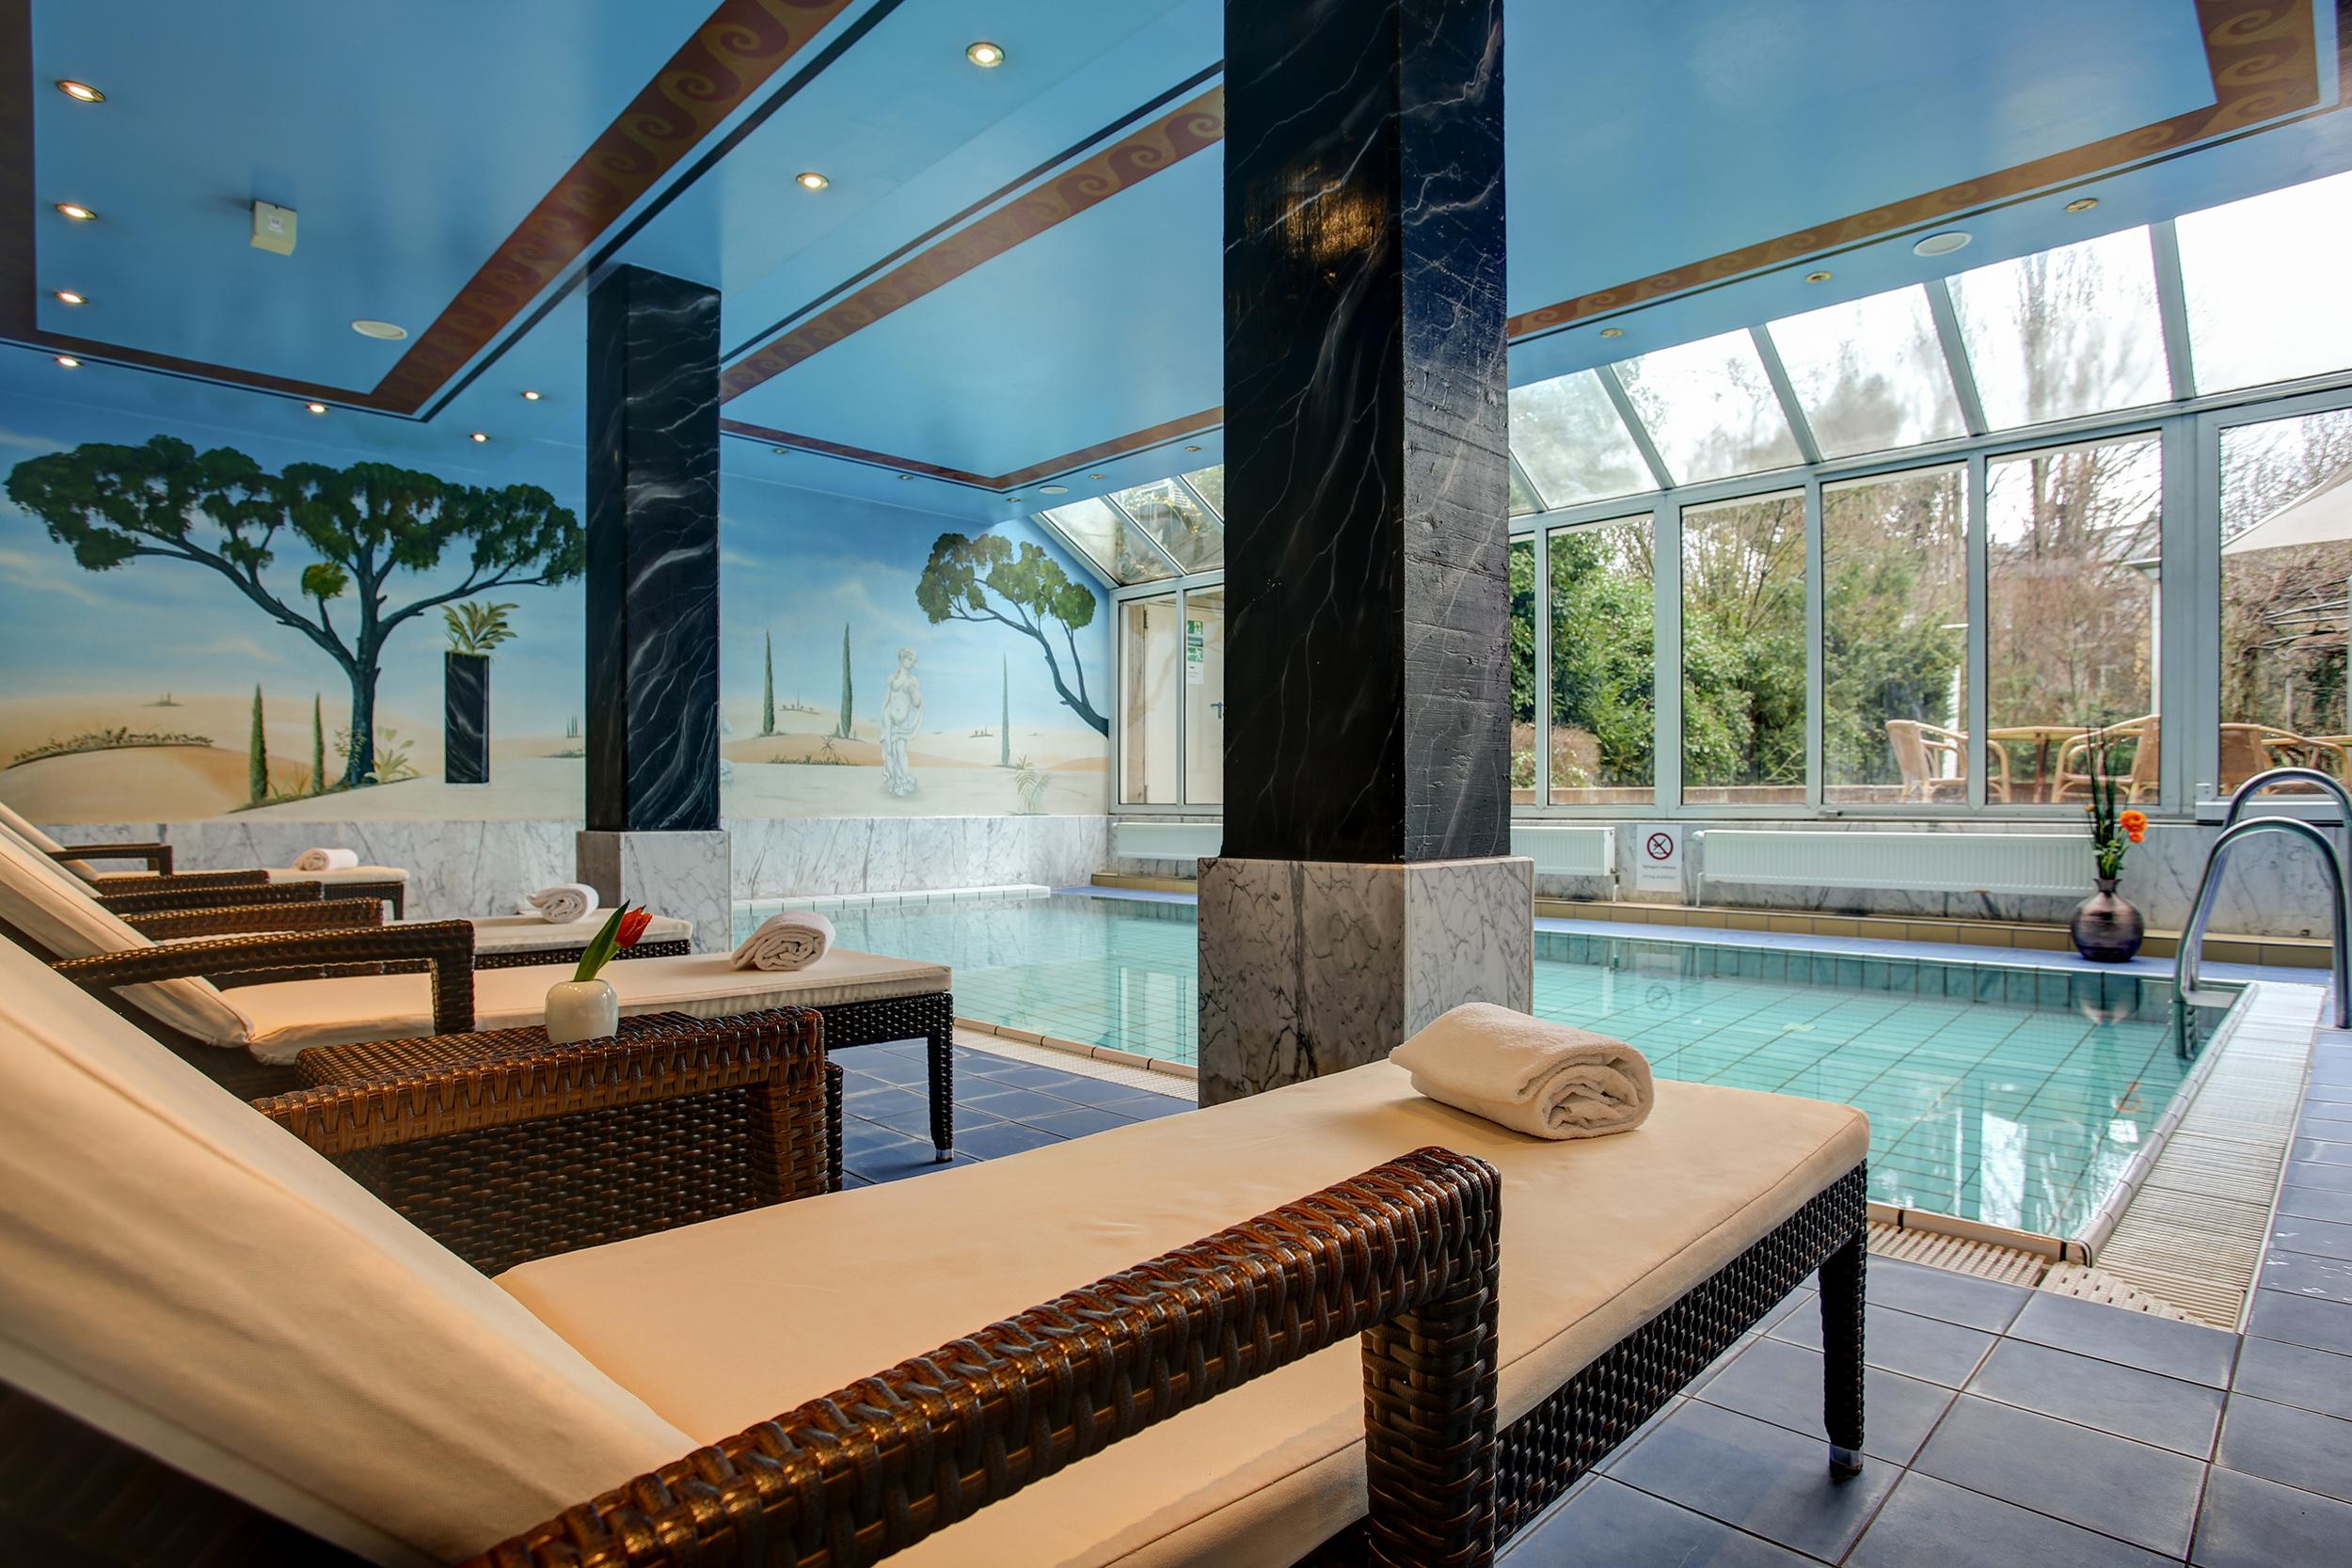 centro hotel residence bonn kontaktieren. Black Bedroom Furniture Sets. Home Design Ideas